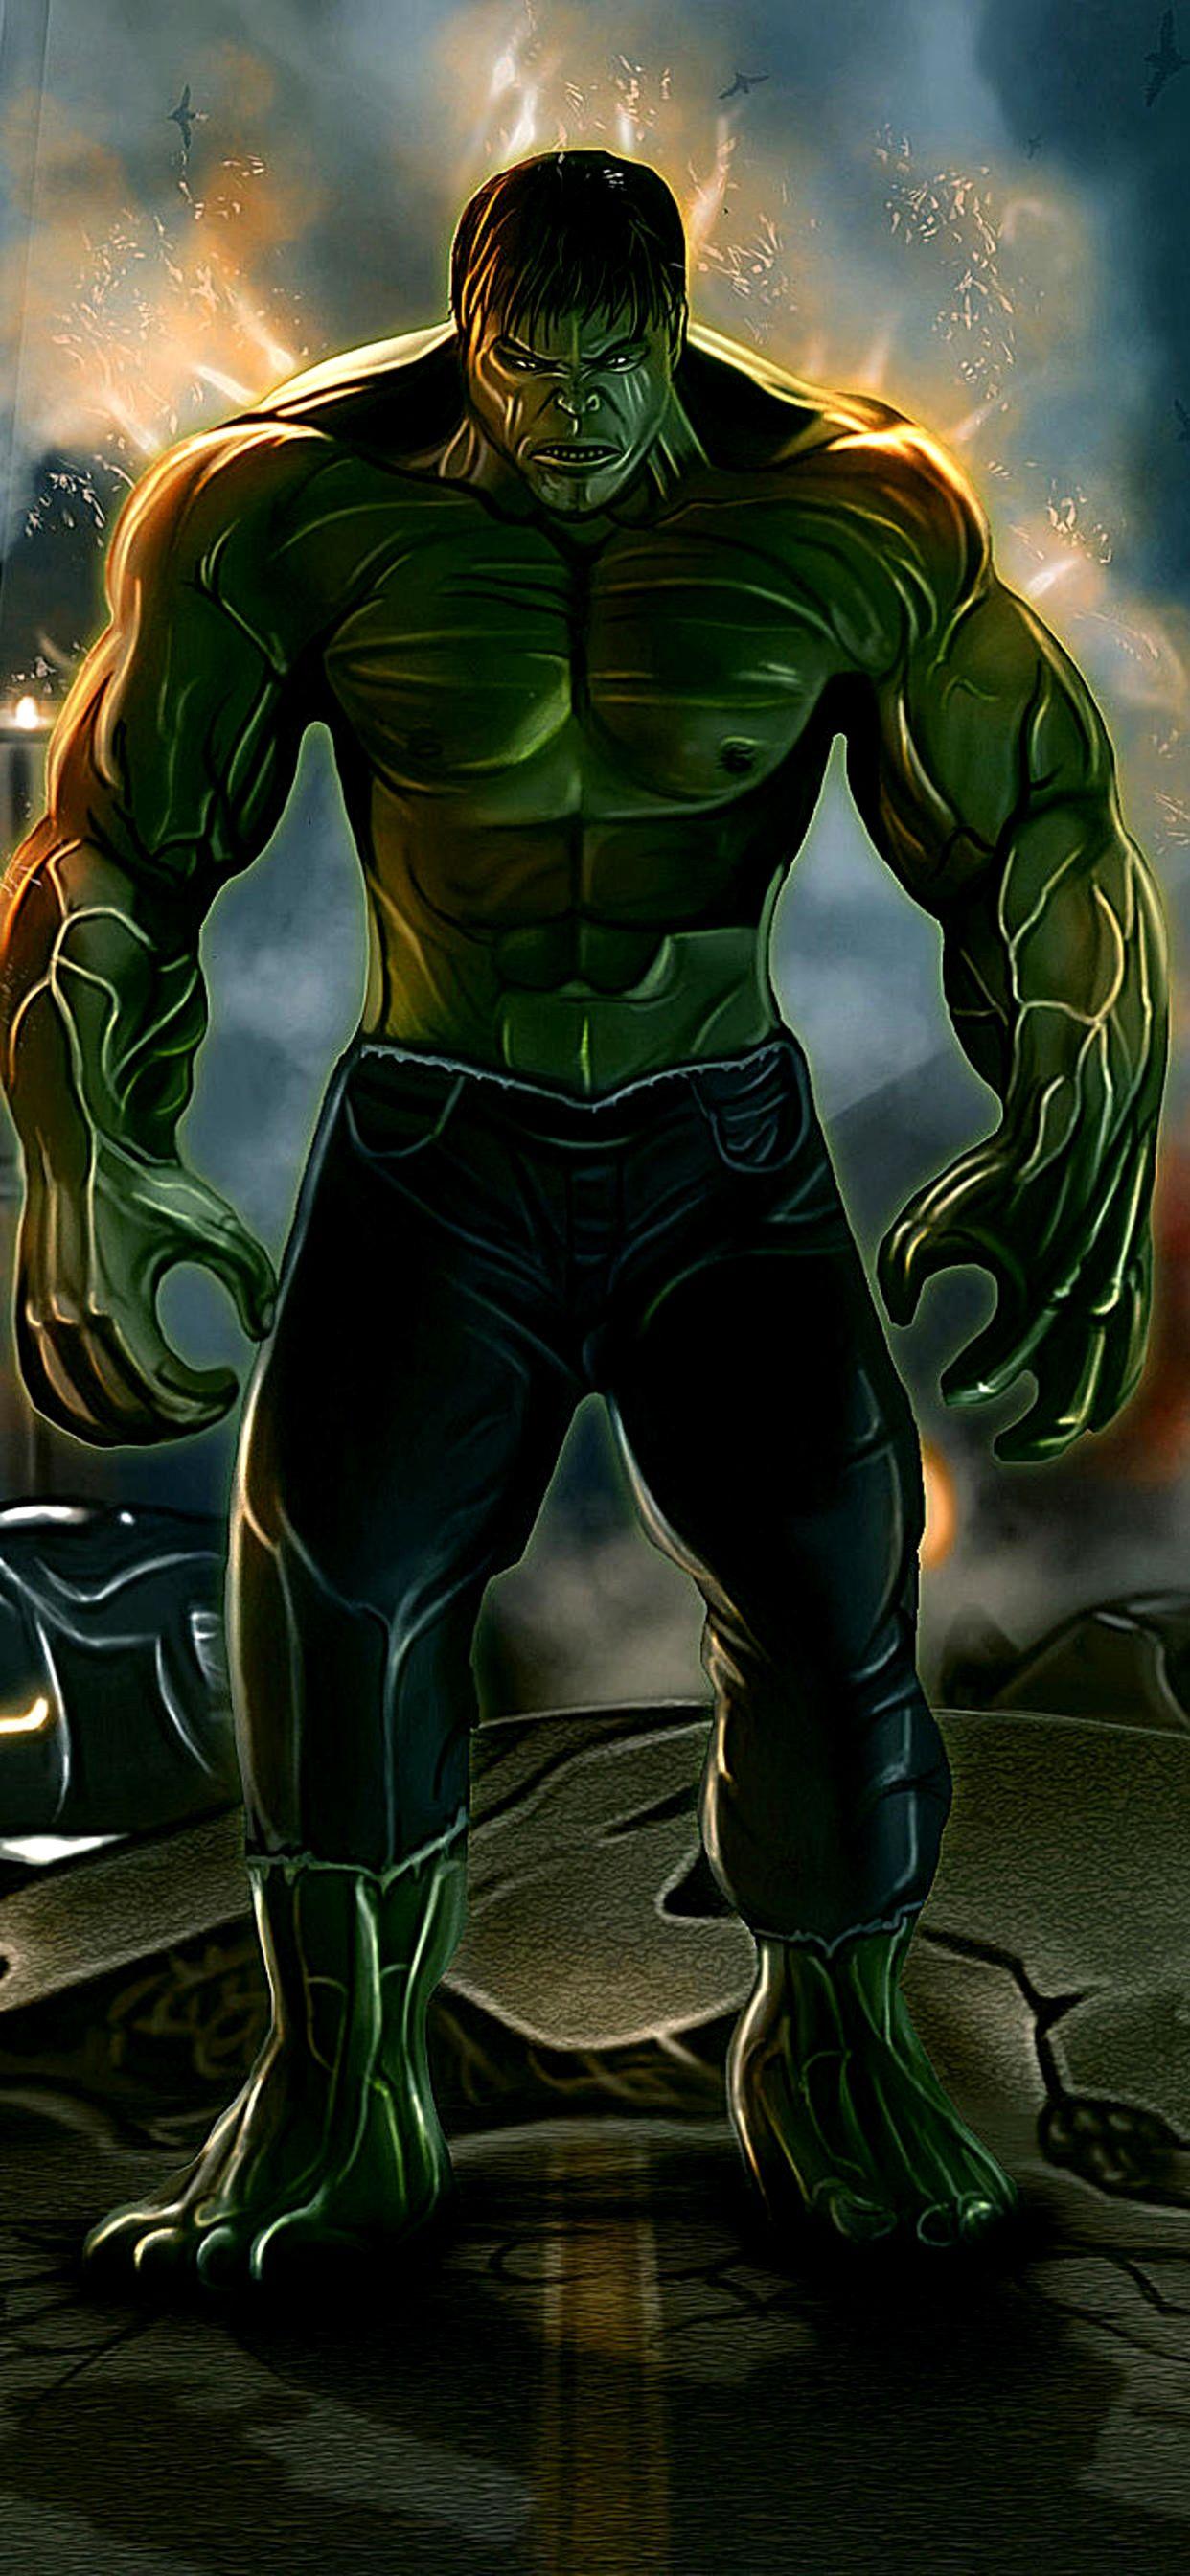 Hulk Wallpaper 4k Iphone Ideas In 2020 Marvel Superhero Posters Angry Hulk Hulk Comic